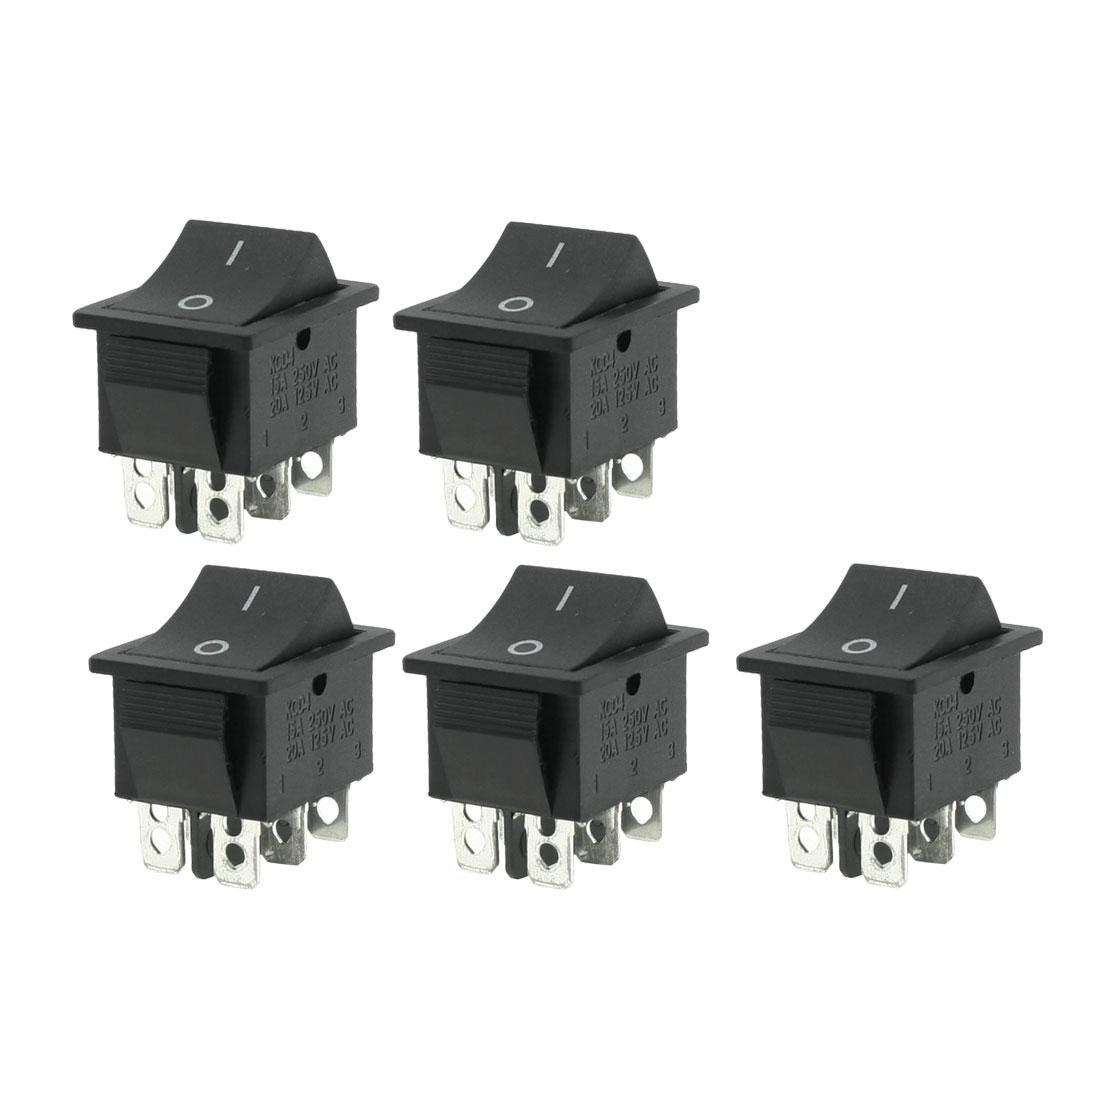 5 Pcs DPDT Black 4 Pins On/Off Rocker Switch AC 250V 15A 125V 20A